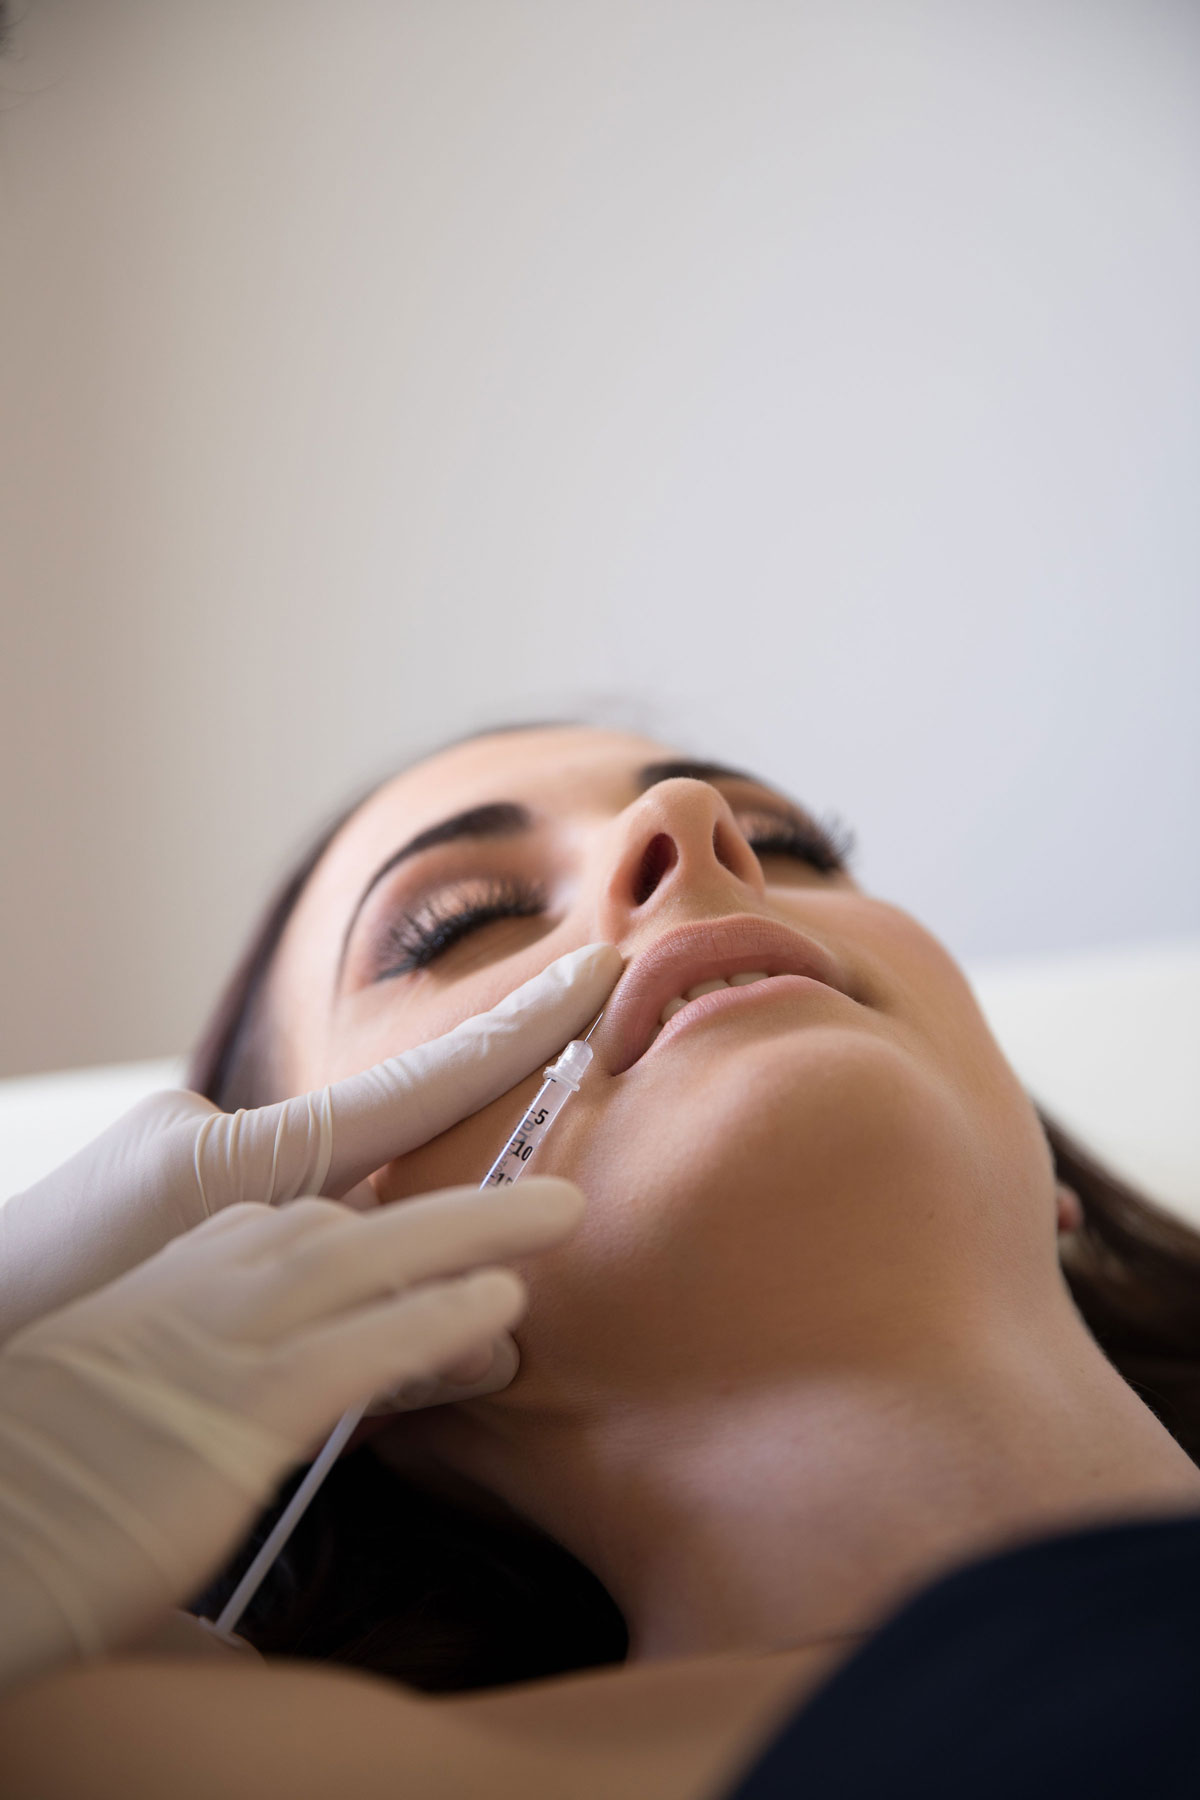 Dr_Fatima_Vindhani_Perth_General_Practitioner_GP_Cosmetic_Doctor_Injectables_DERMAL_FILLERS.jpg